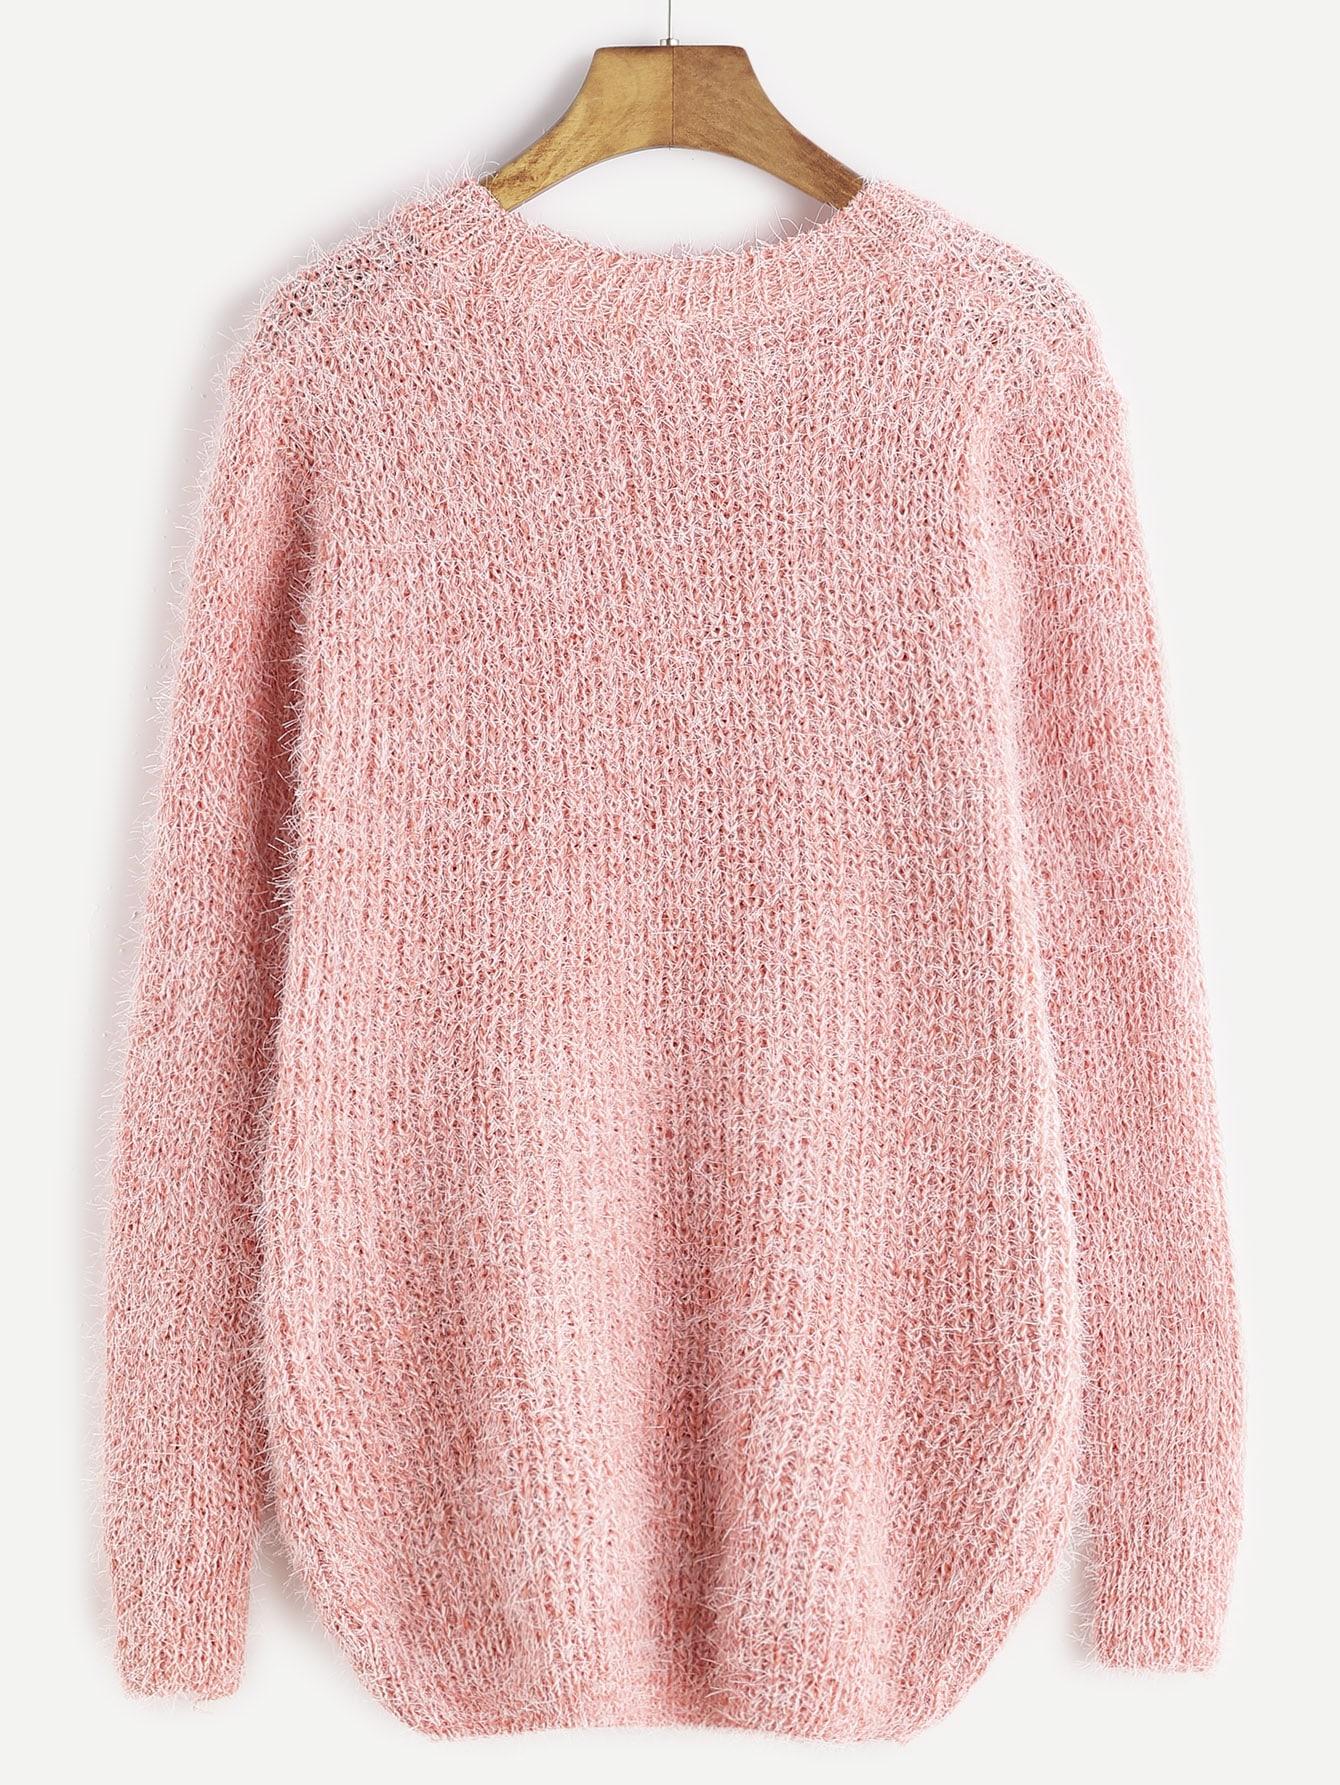 sweater161121302_2